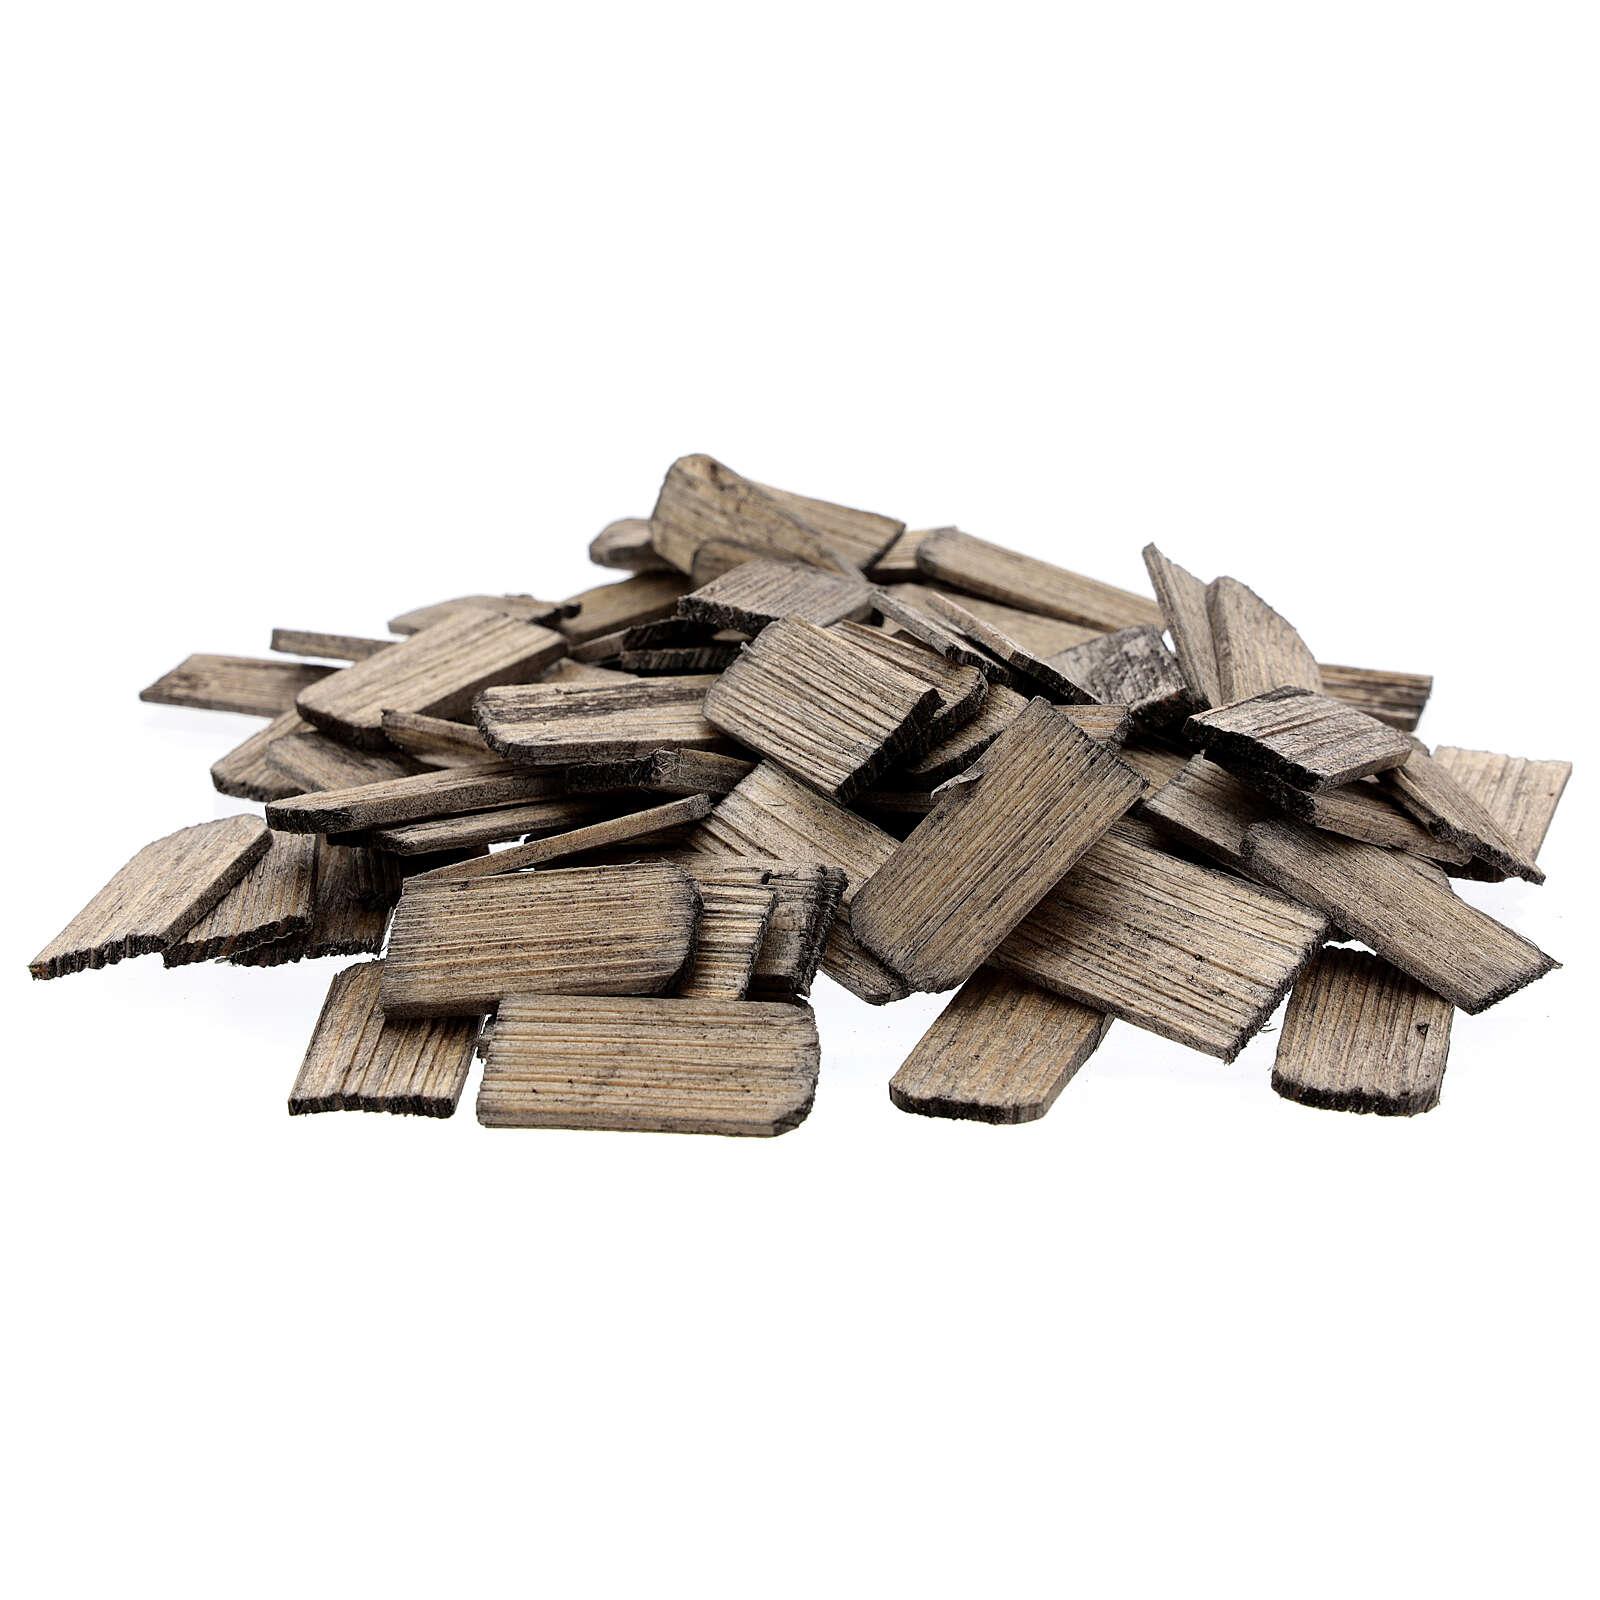 Wood shingles 3x1,5 cm 100 pieces for DIY Nativity Scene 4